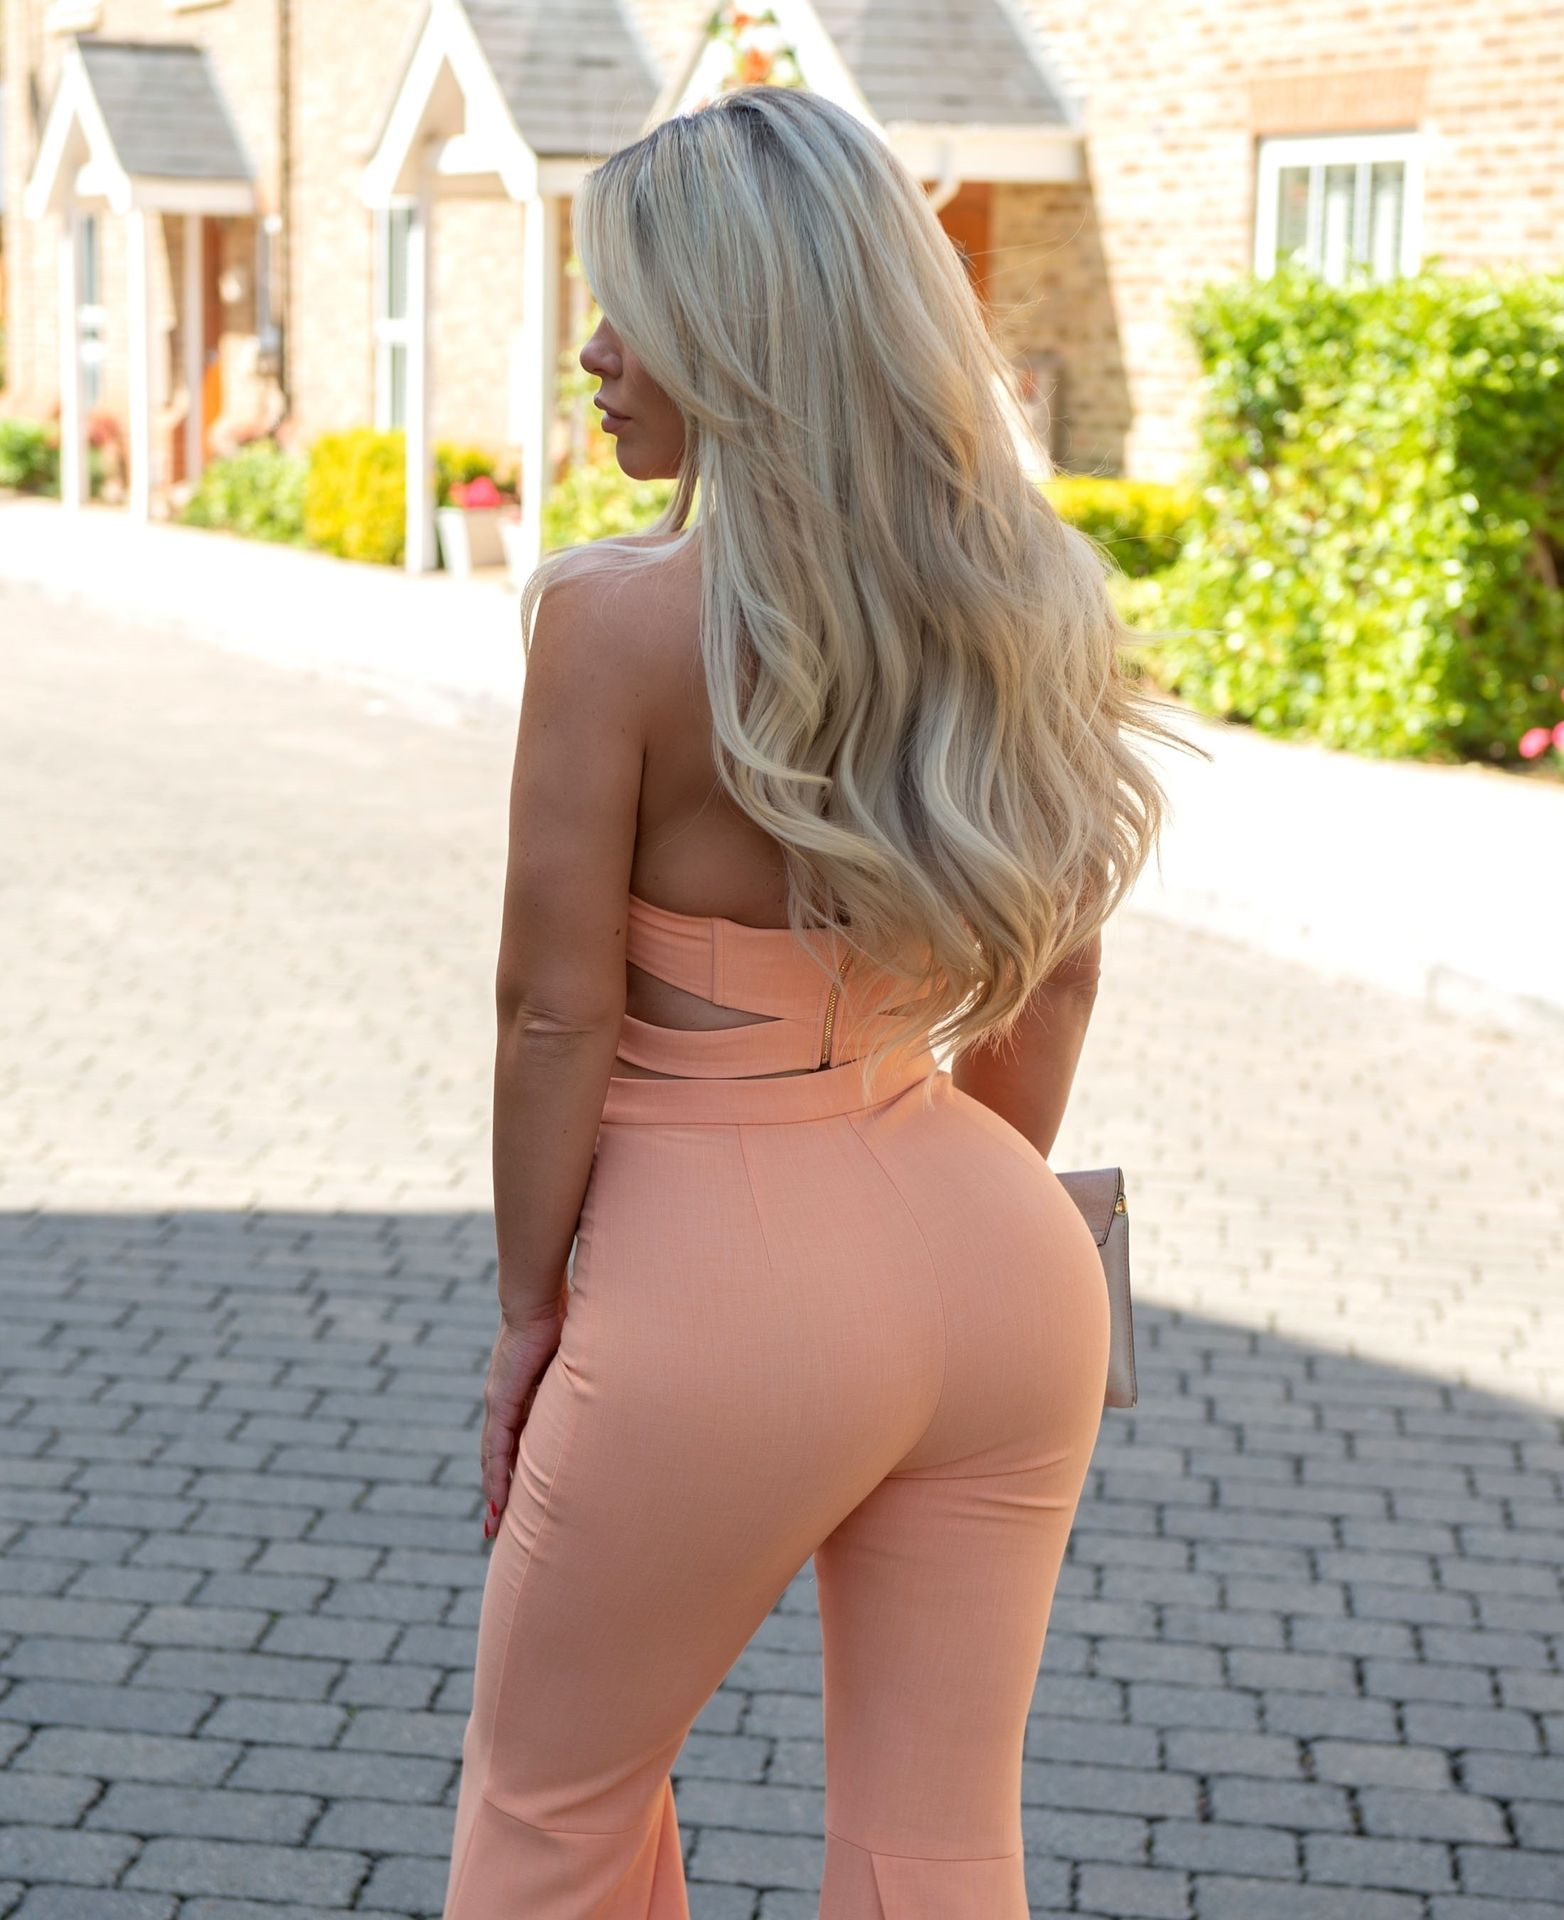 Bianca-Gascoigne-Sexy-The-Fappening-Blog-2.jpg